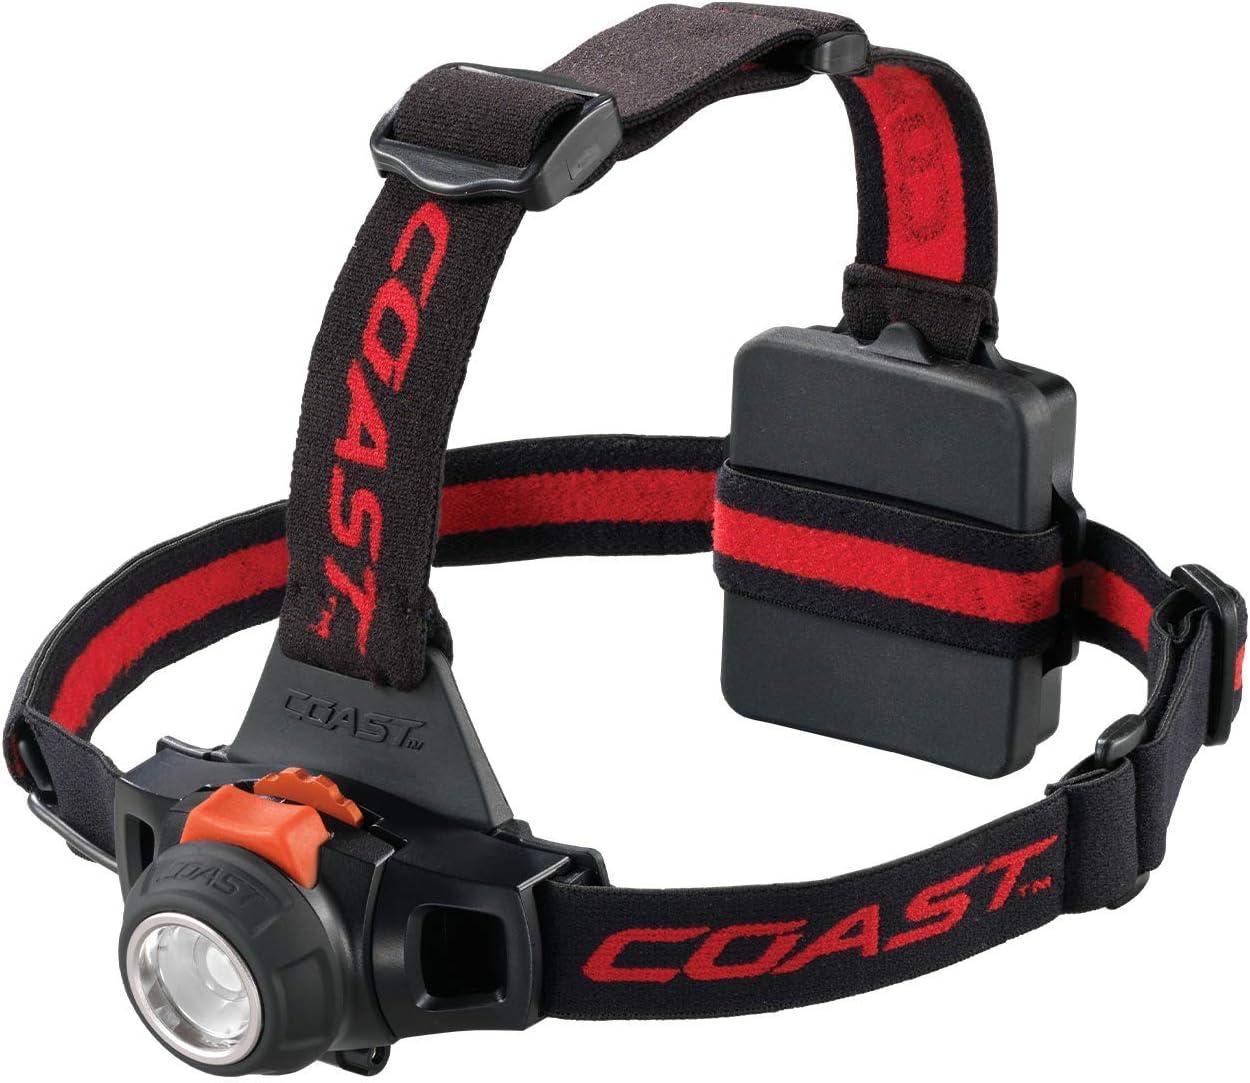 Coast Hl27 360 Lumen Pure Beam Focusing Led Headlamp With Twist Focus And Variable Light Control Wheel Black Blacks 330 Lumens Amazon Com